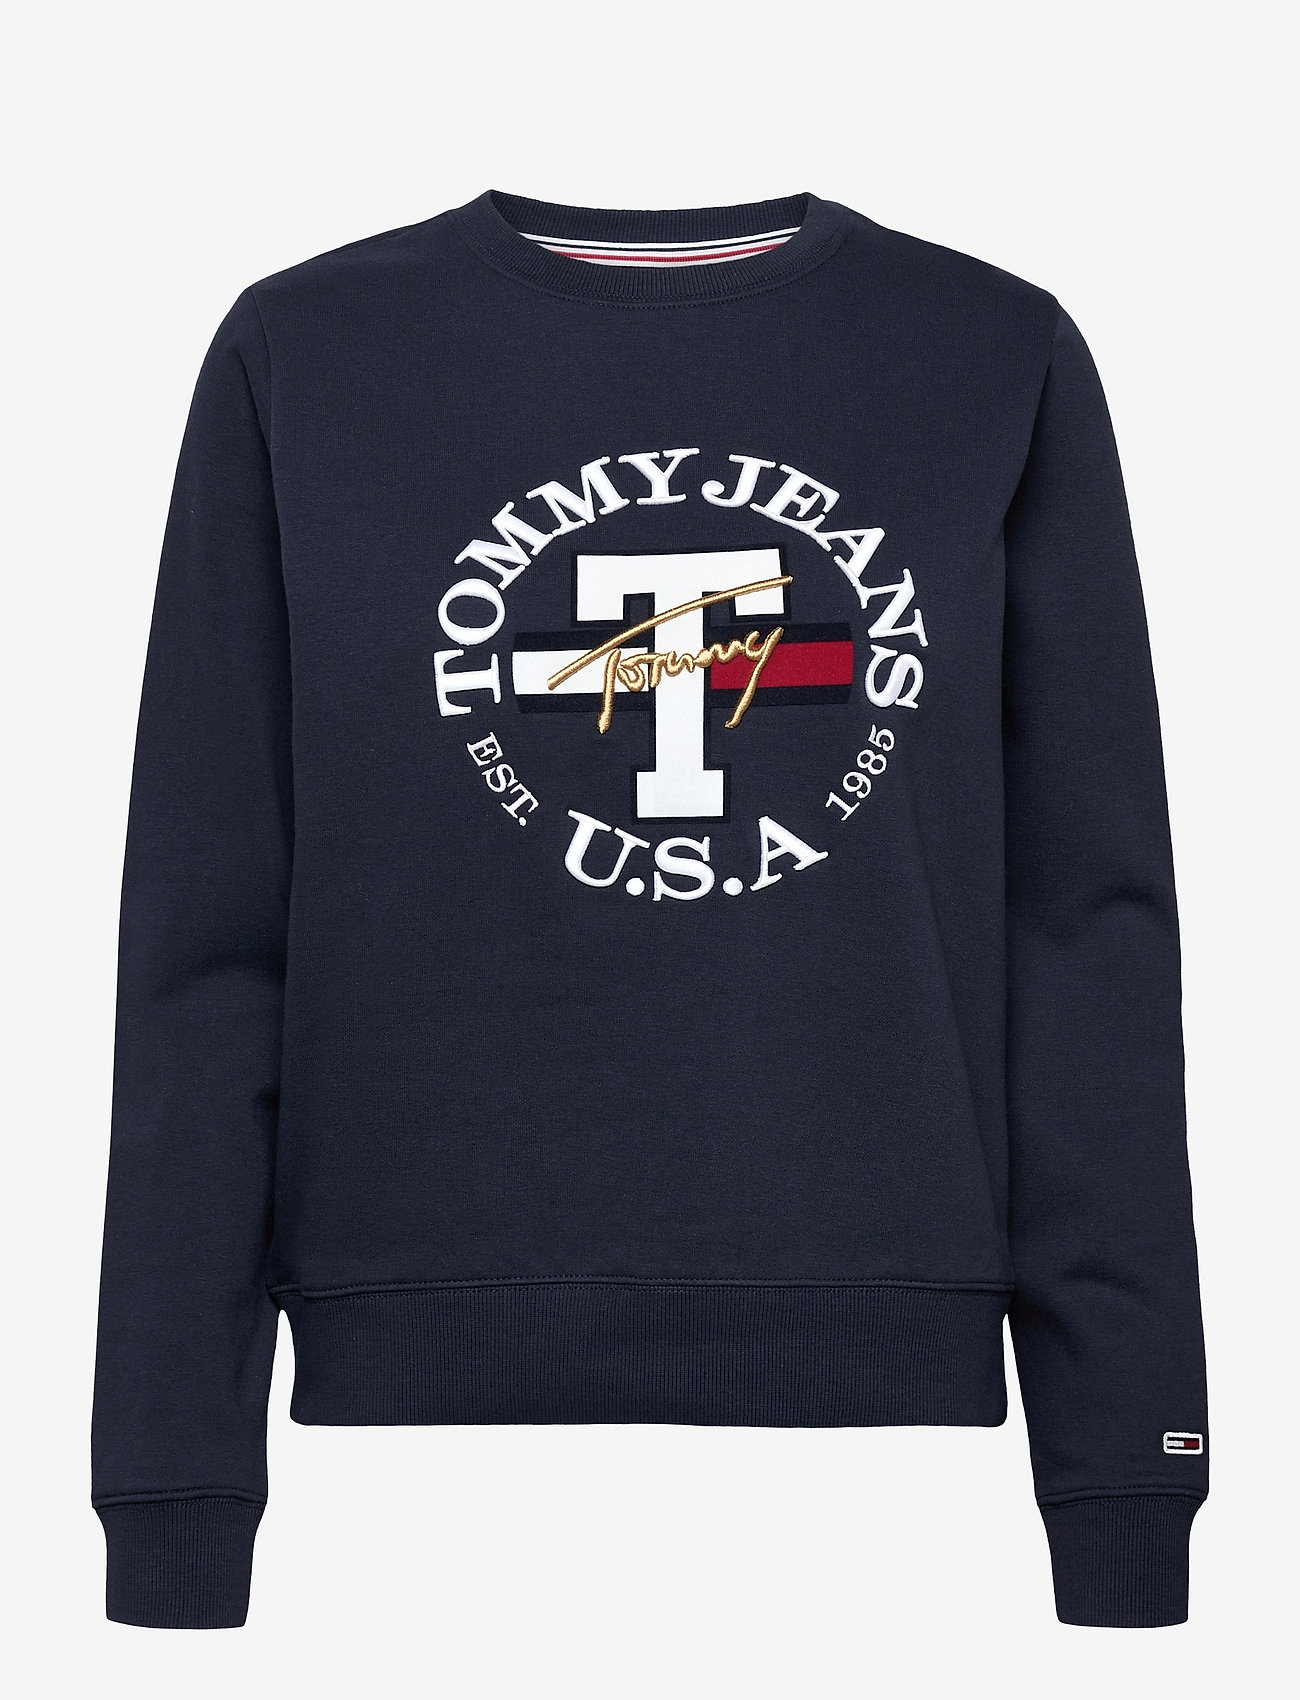 Tommy Jeans - TJW REGULAR TWISTED LOGO CREW - sweatshirts & hoodies - twilight navy - 0